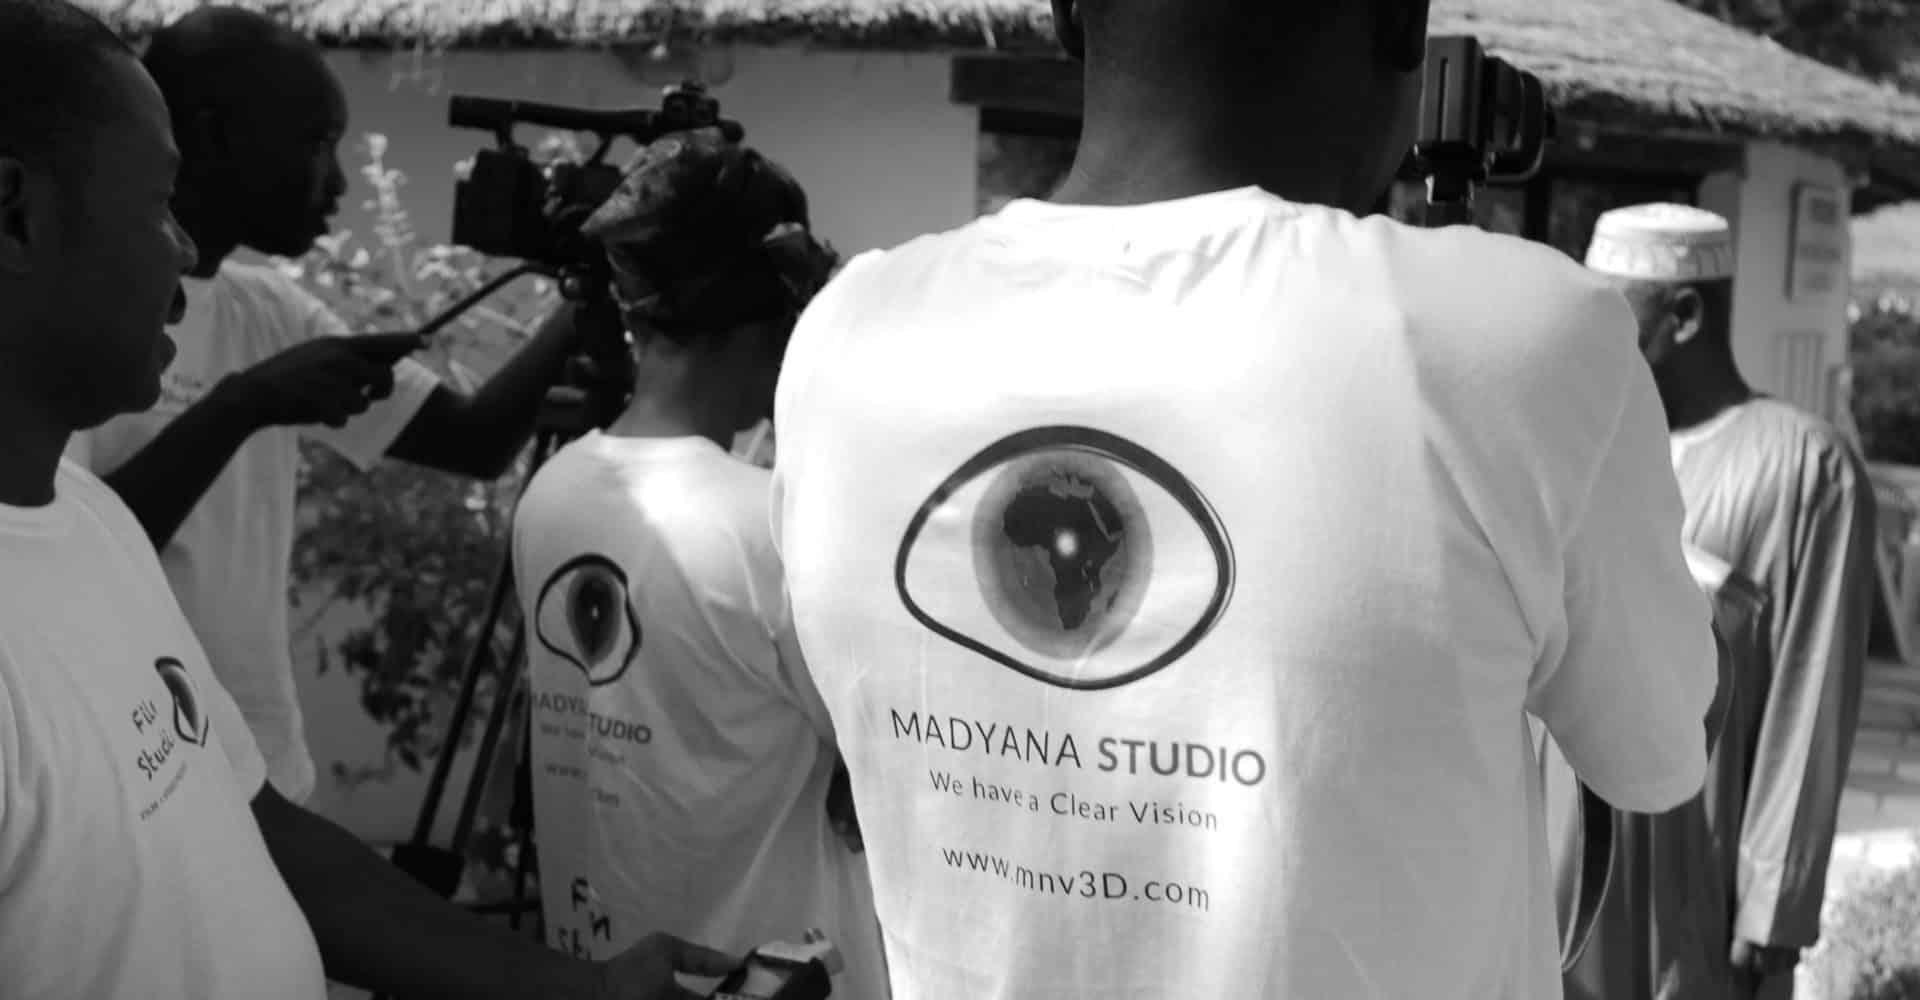 Madyana Studio Video Production